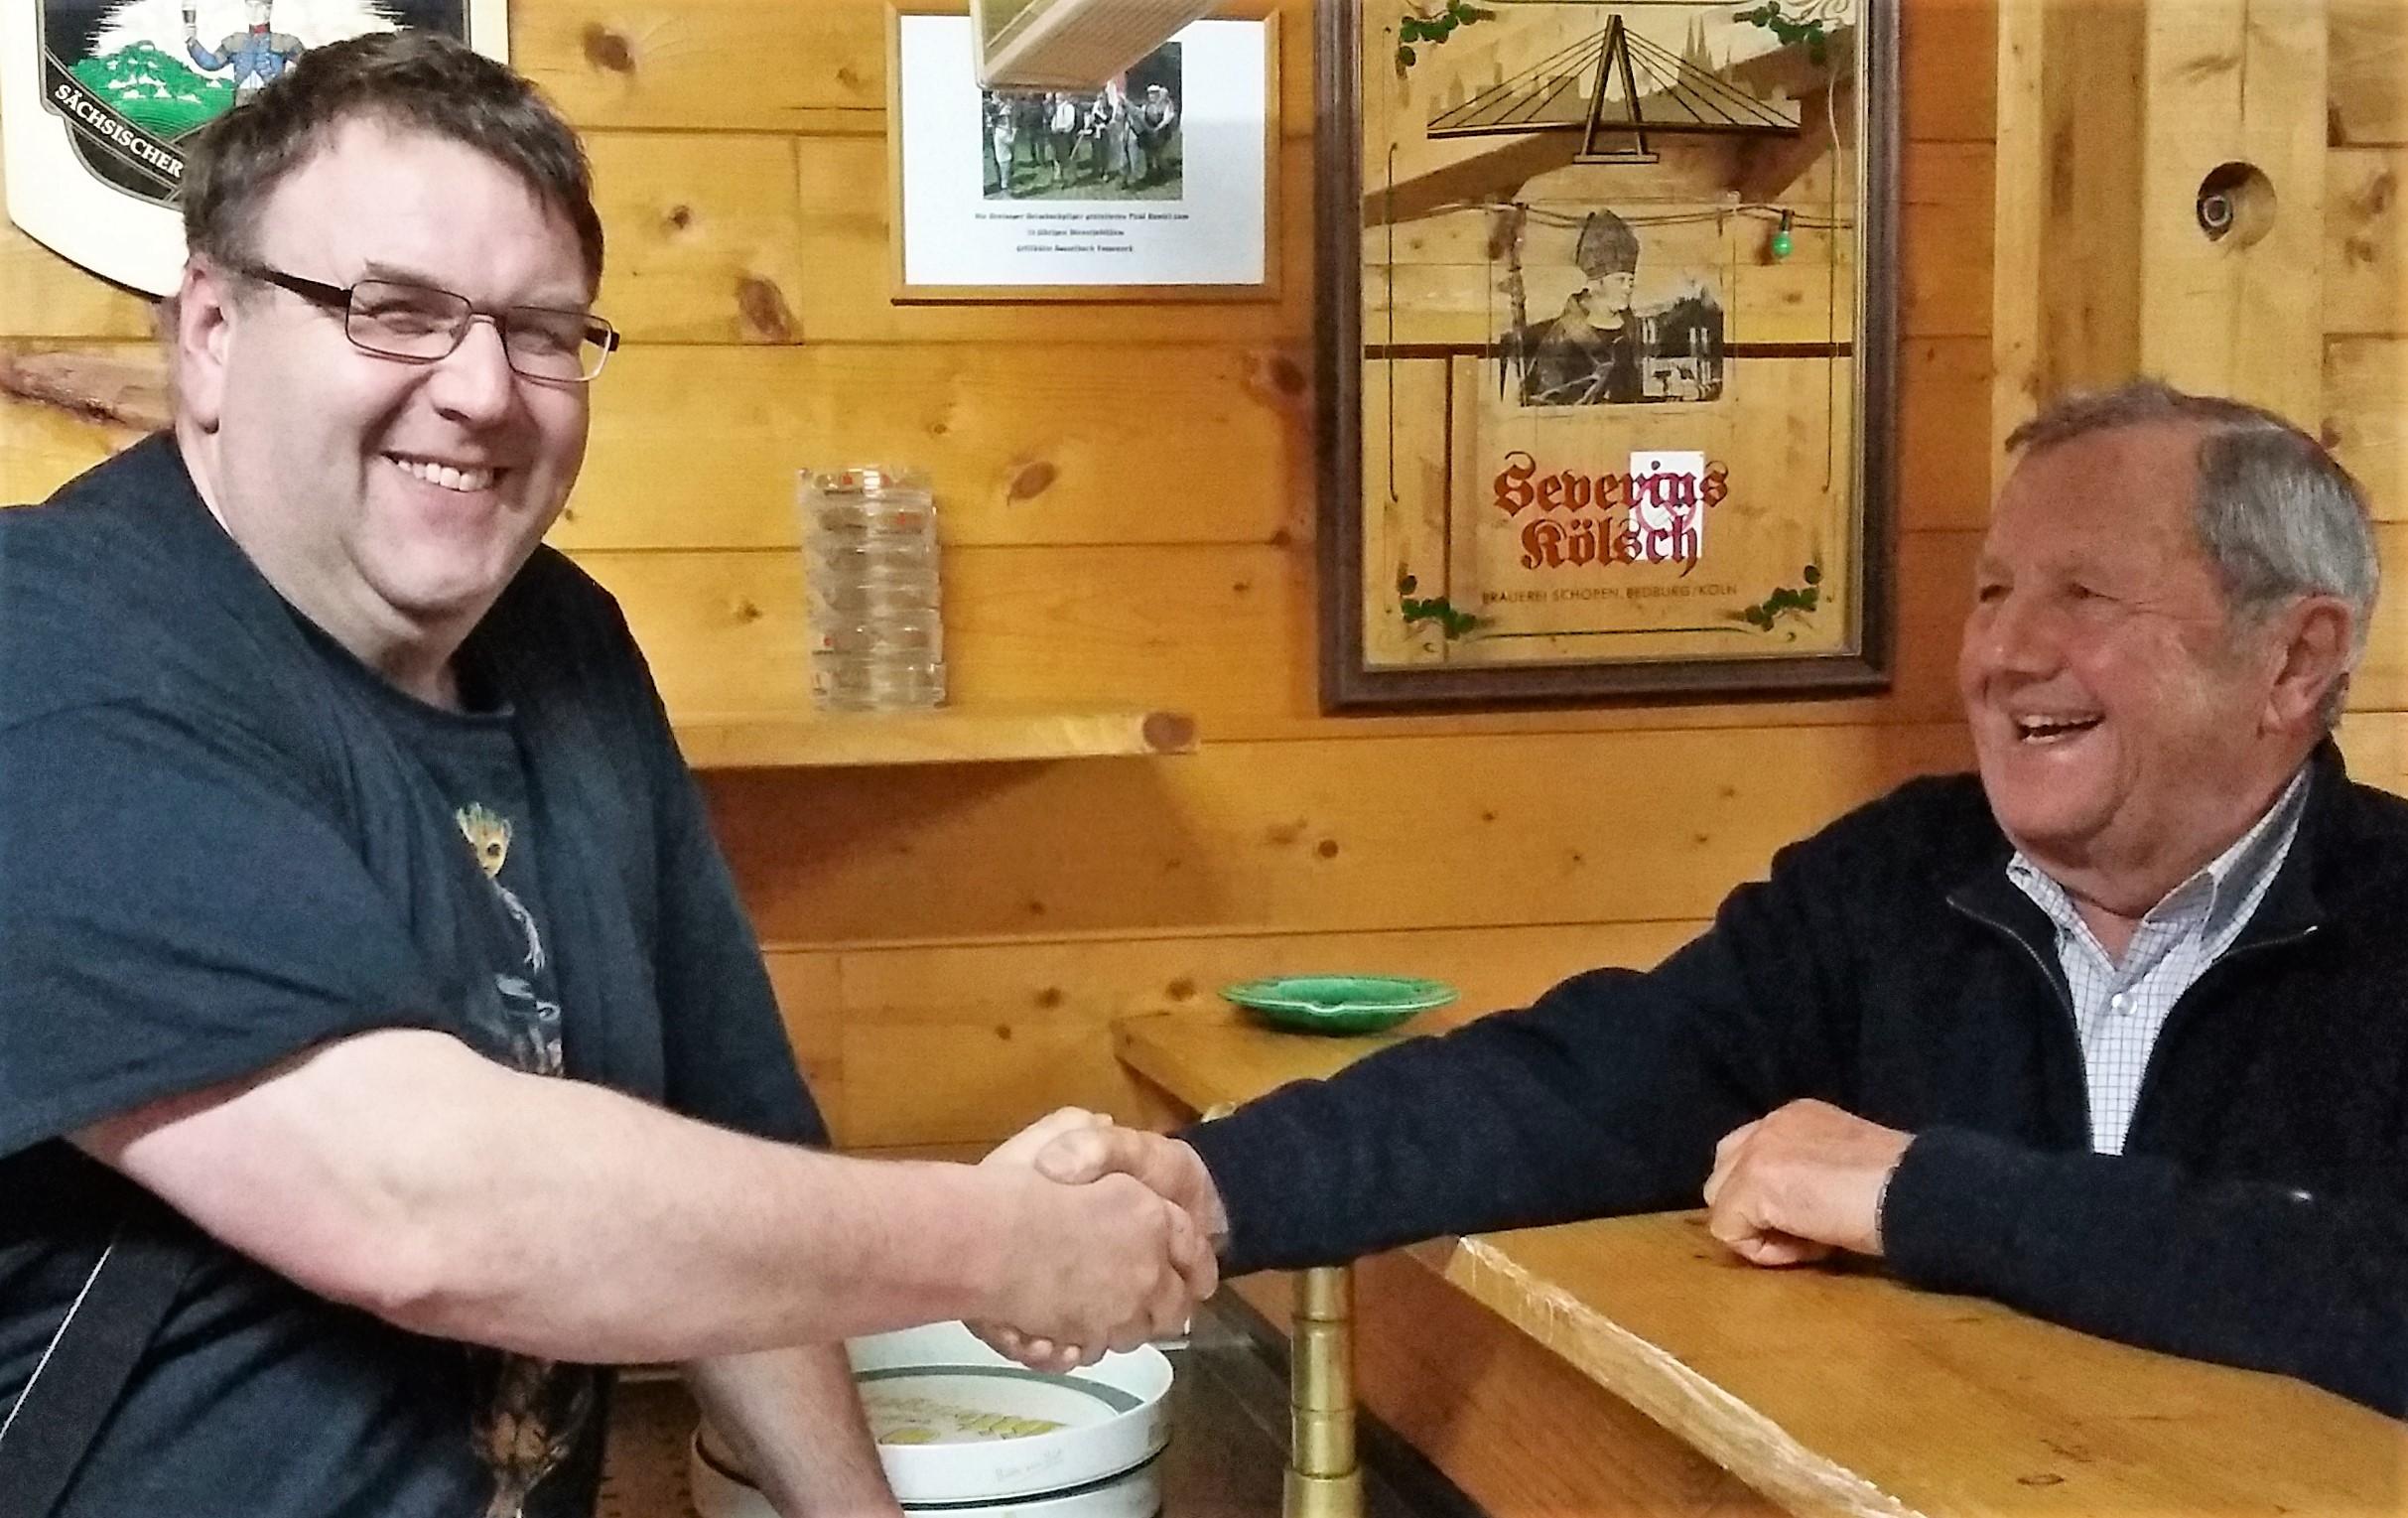 Grillhütte Bosselbach - neuer Hüttenwart